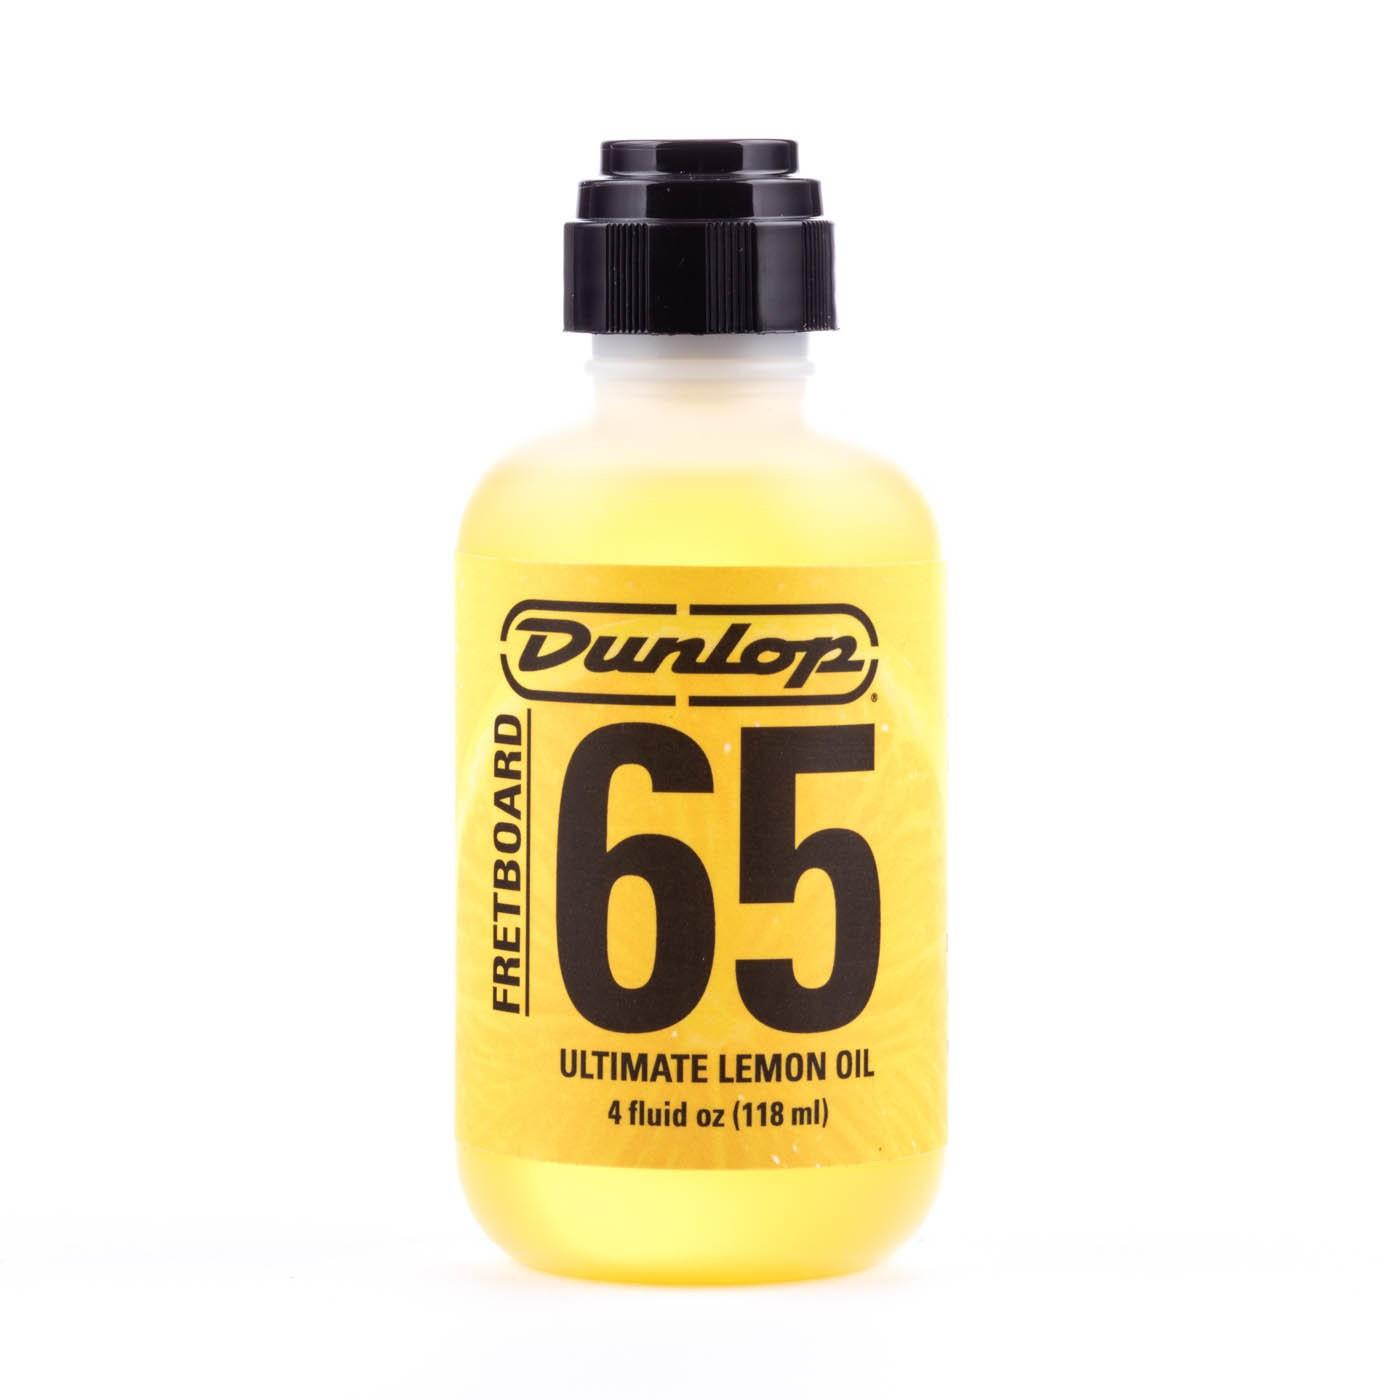 Dunlop Formula 65 Ultimate Zitronen/Lemon Oil